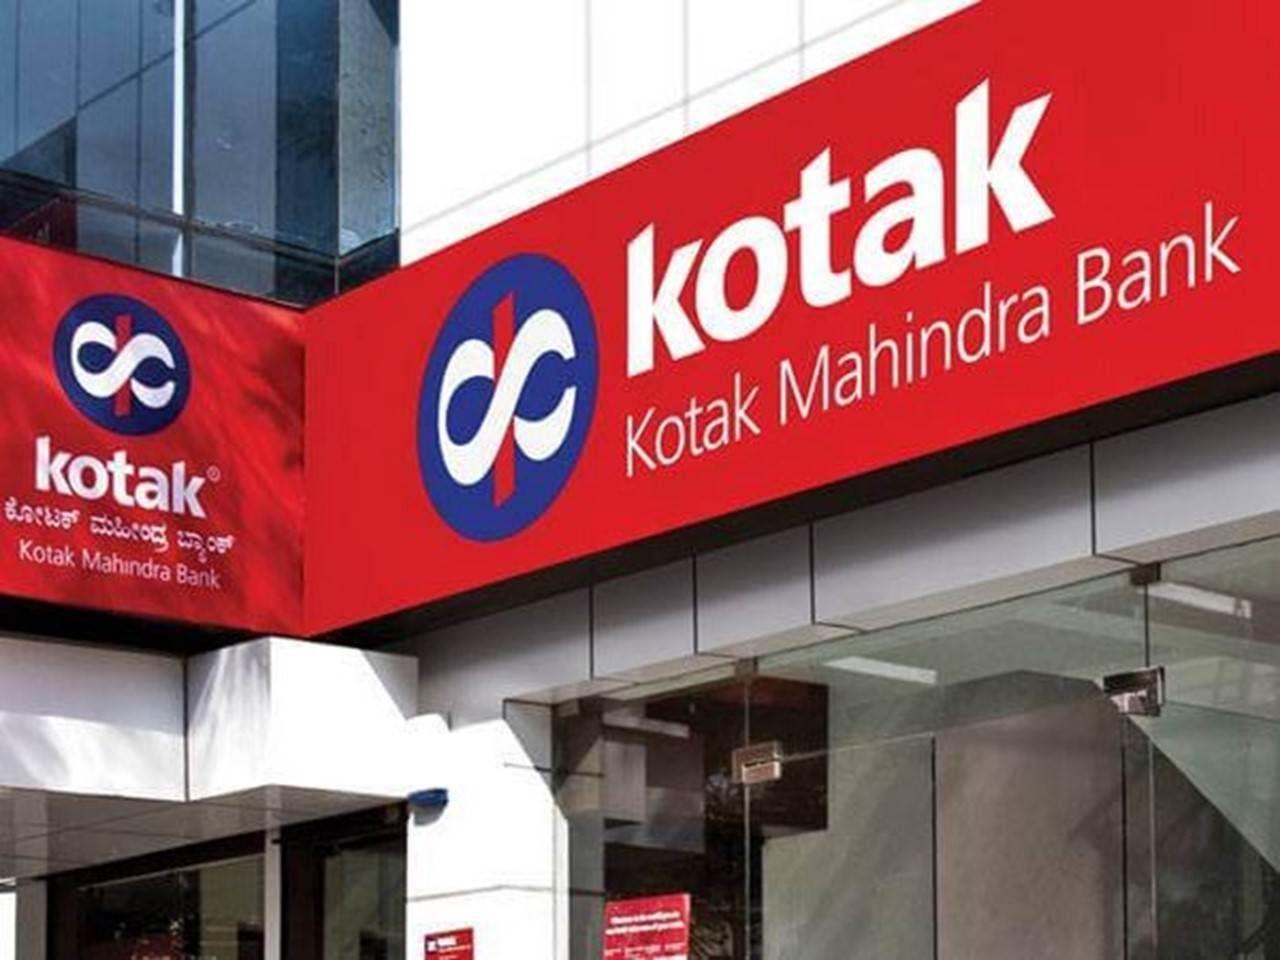 Rbi Approves Shareholding Dilution Plan Of Kotak Mahindra Bank S Promoters Techgraph Kotak Mahindra Bank Indusind Bank Debt Relief Programs